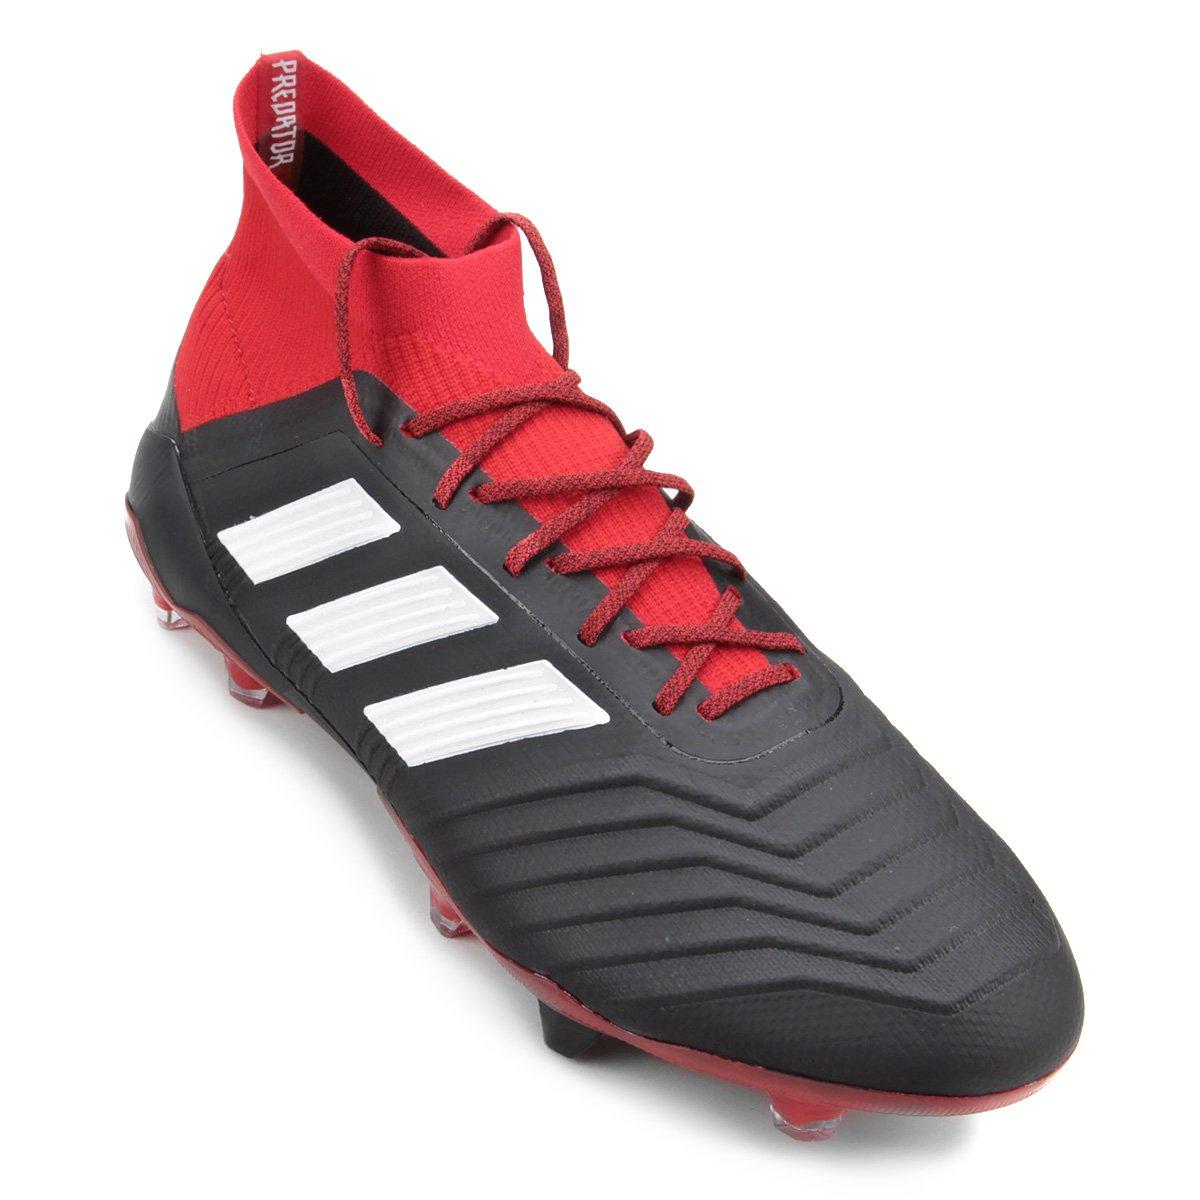 71a256b1983a8 Chuteira Campo Adidas Predator 18 1 FG